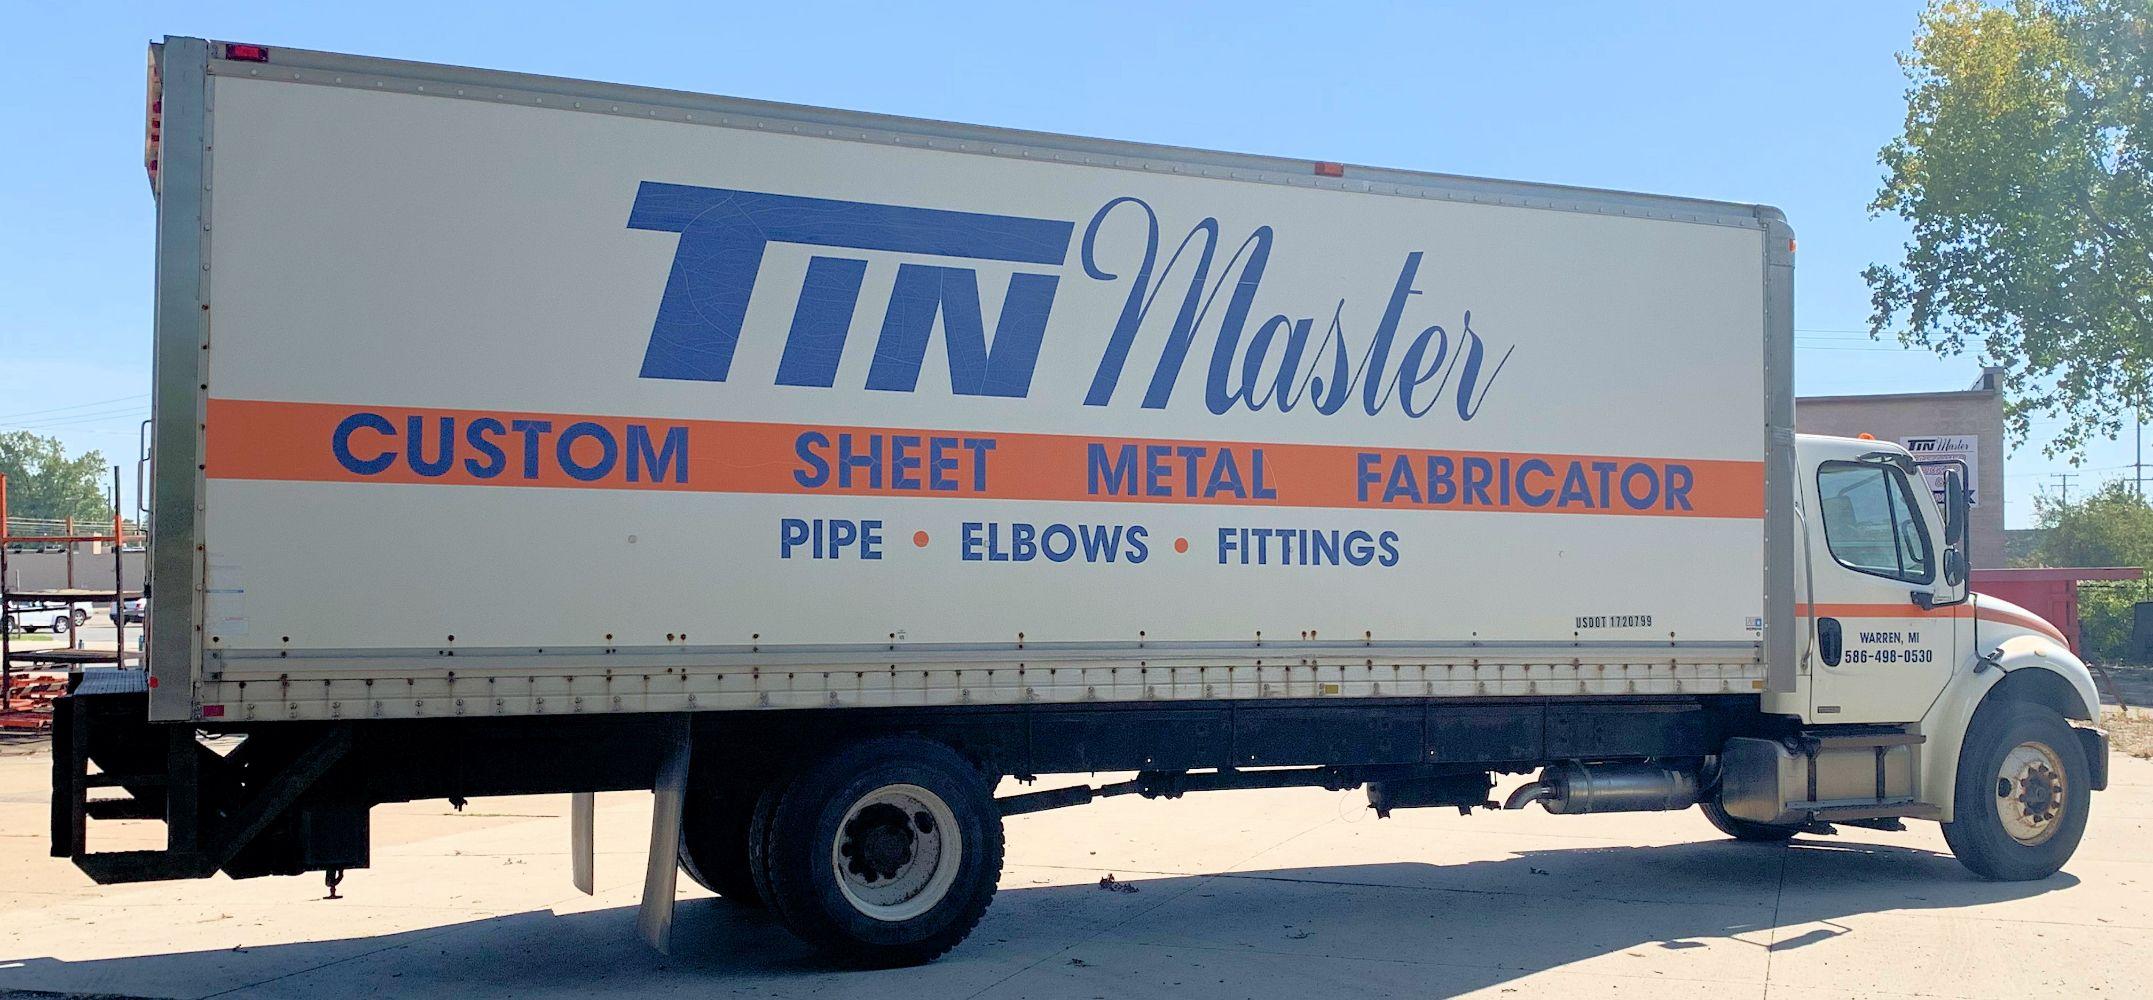 Tin Master - A Fabricator of Sheet Metal & Duct Work